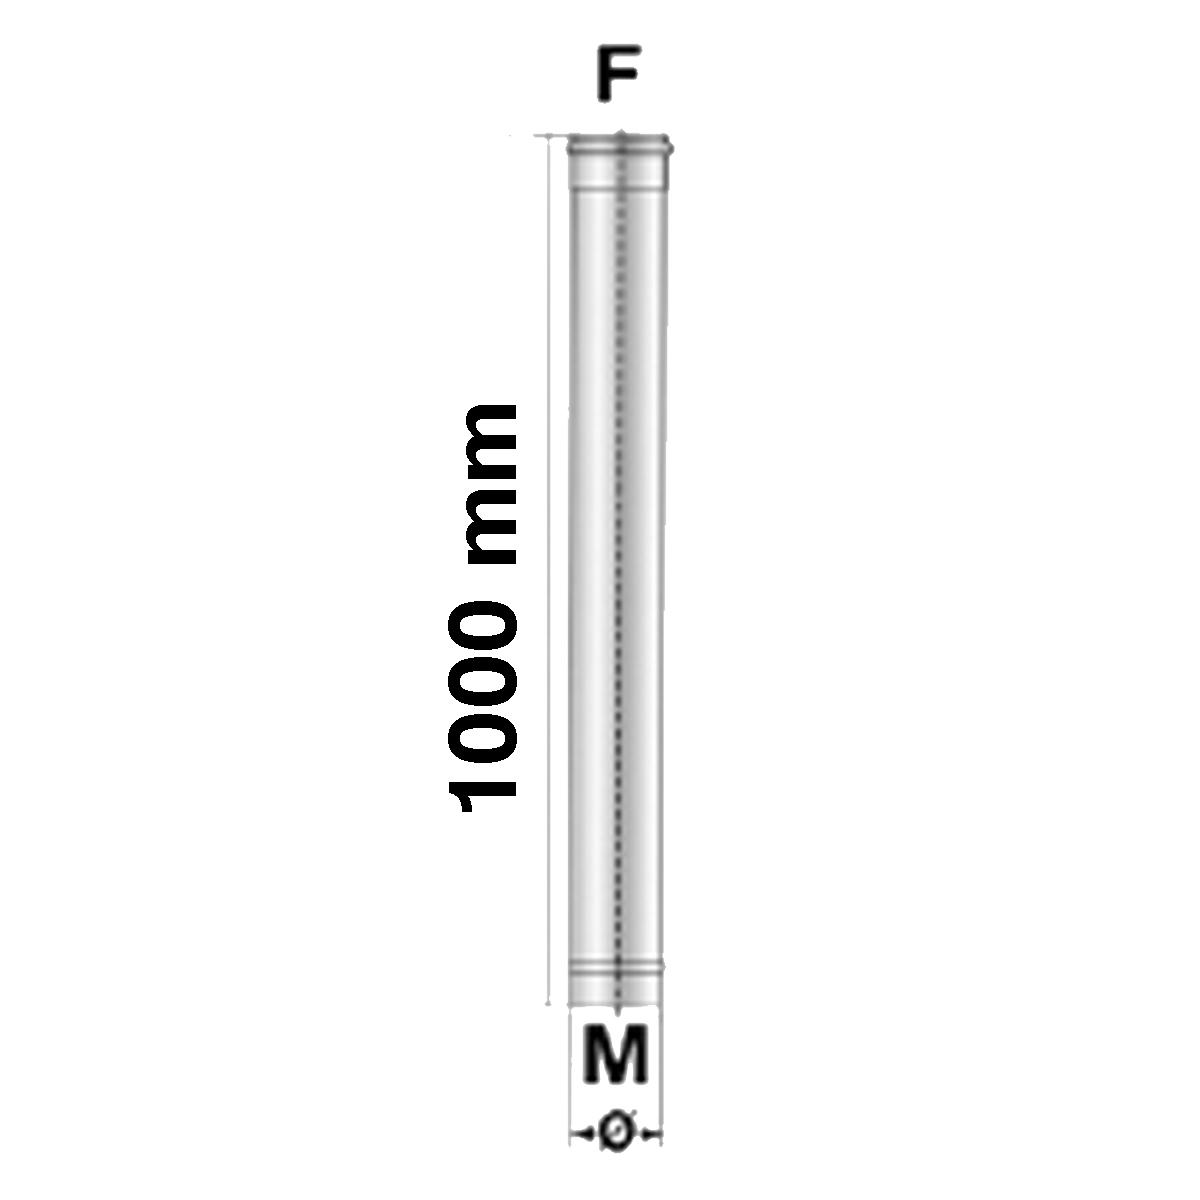 Afvoerbuis 100 cm-Ø80mm-RVS